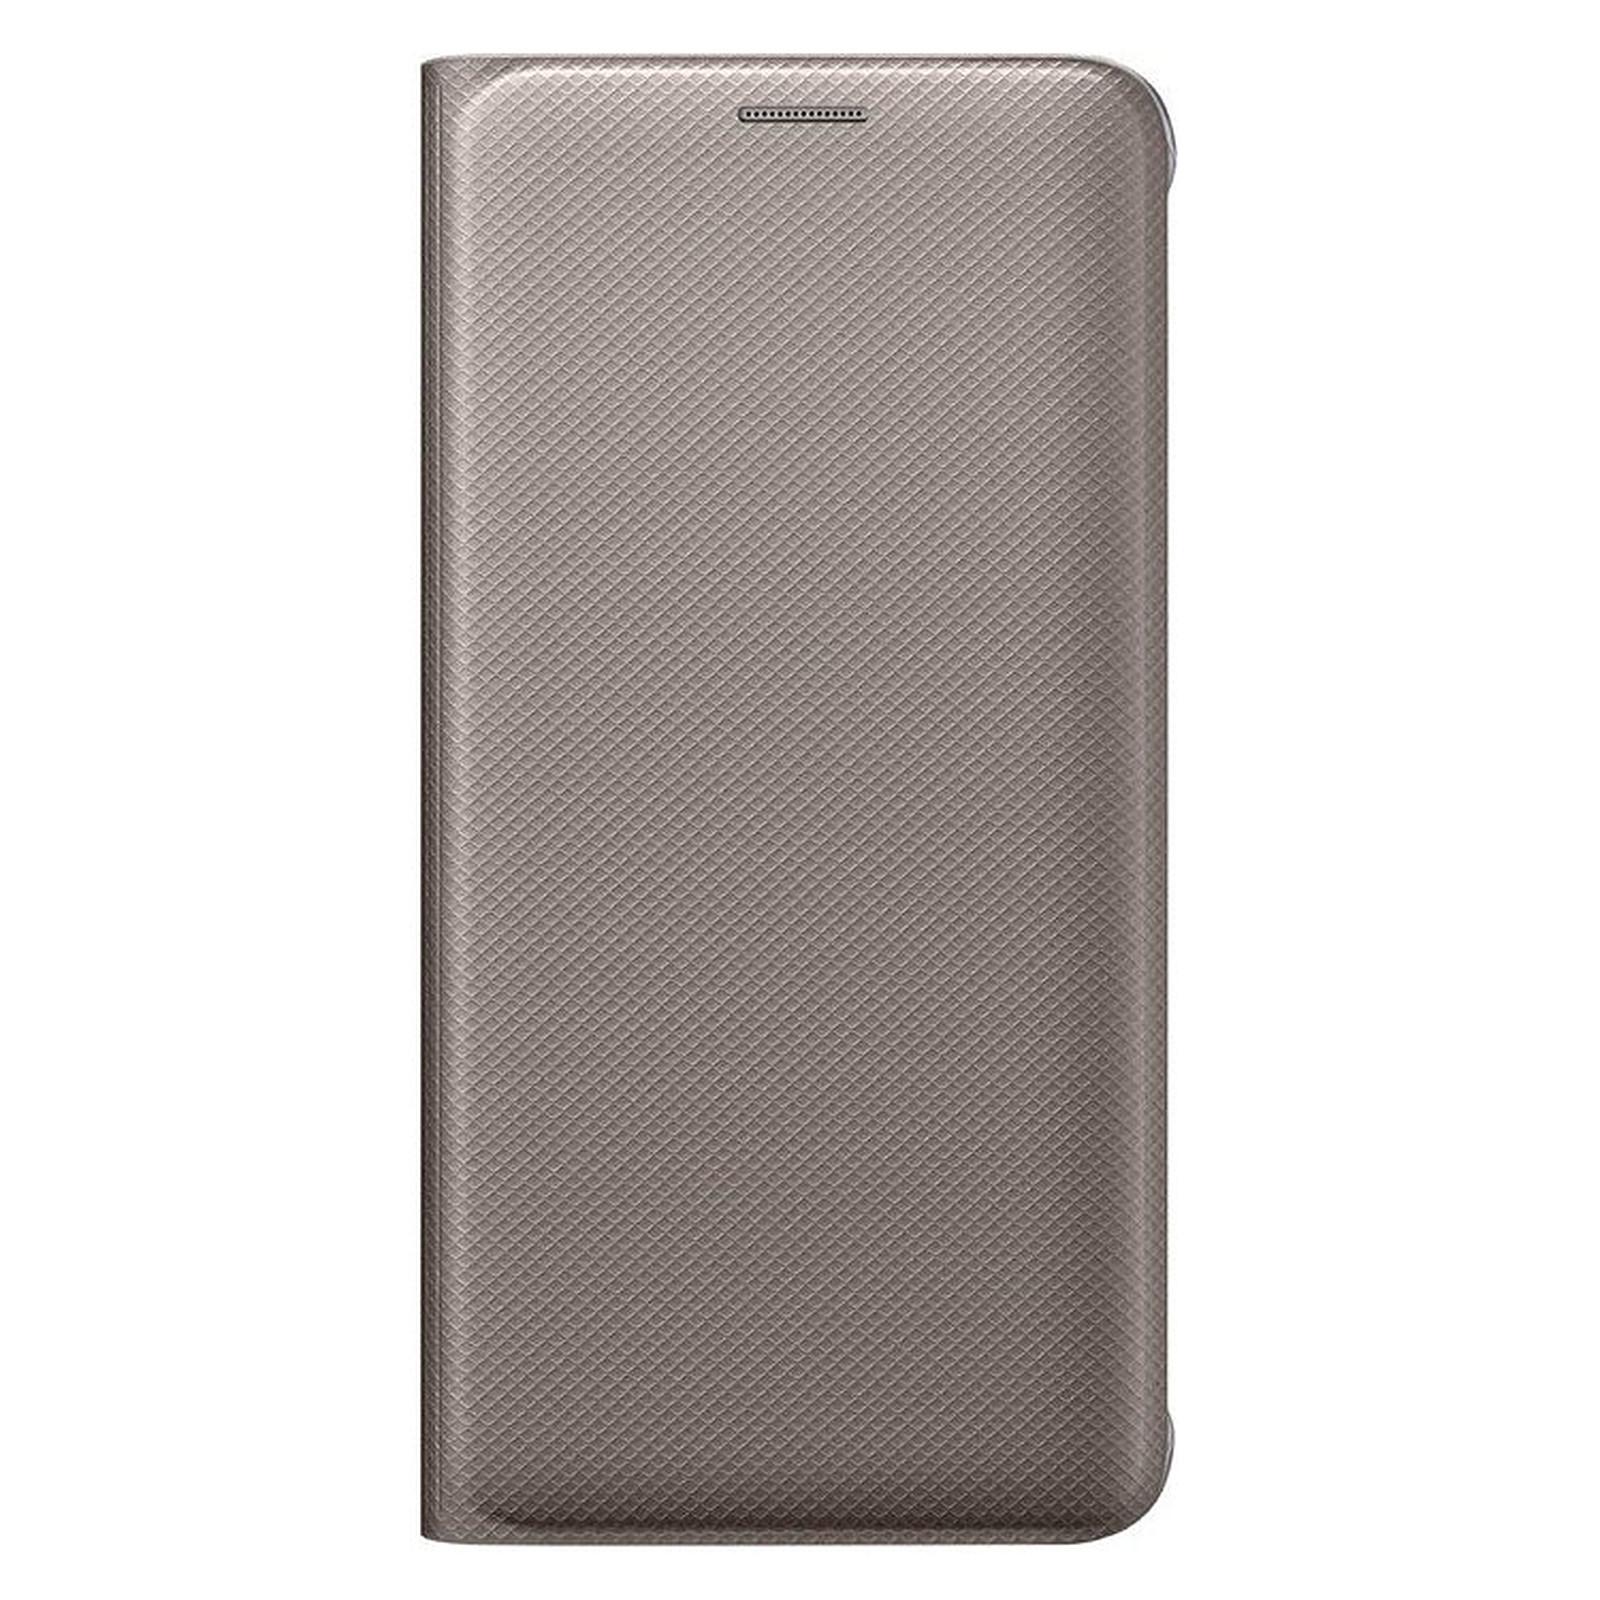 Samsung Flip Wallet Or Galaxy S6 Edge+